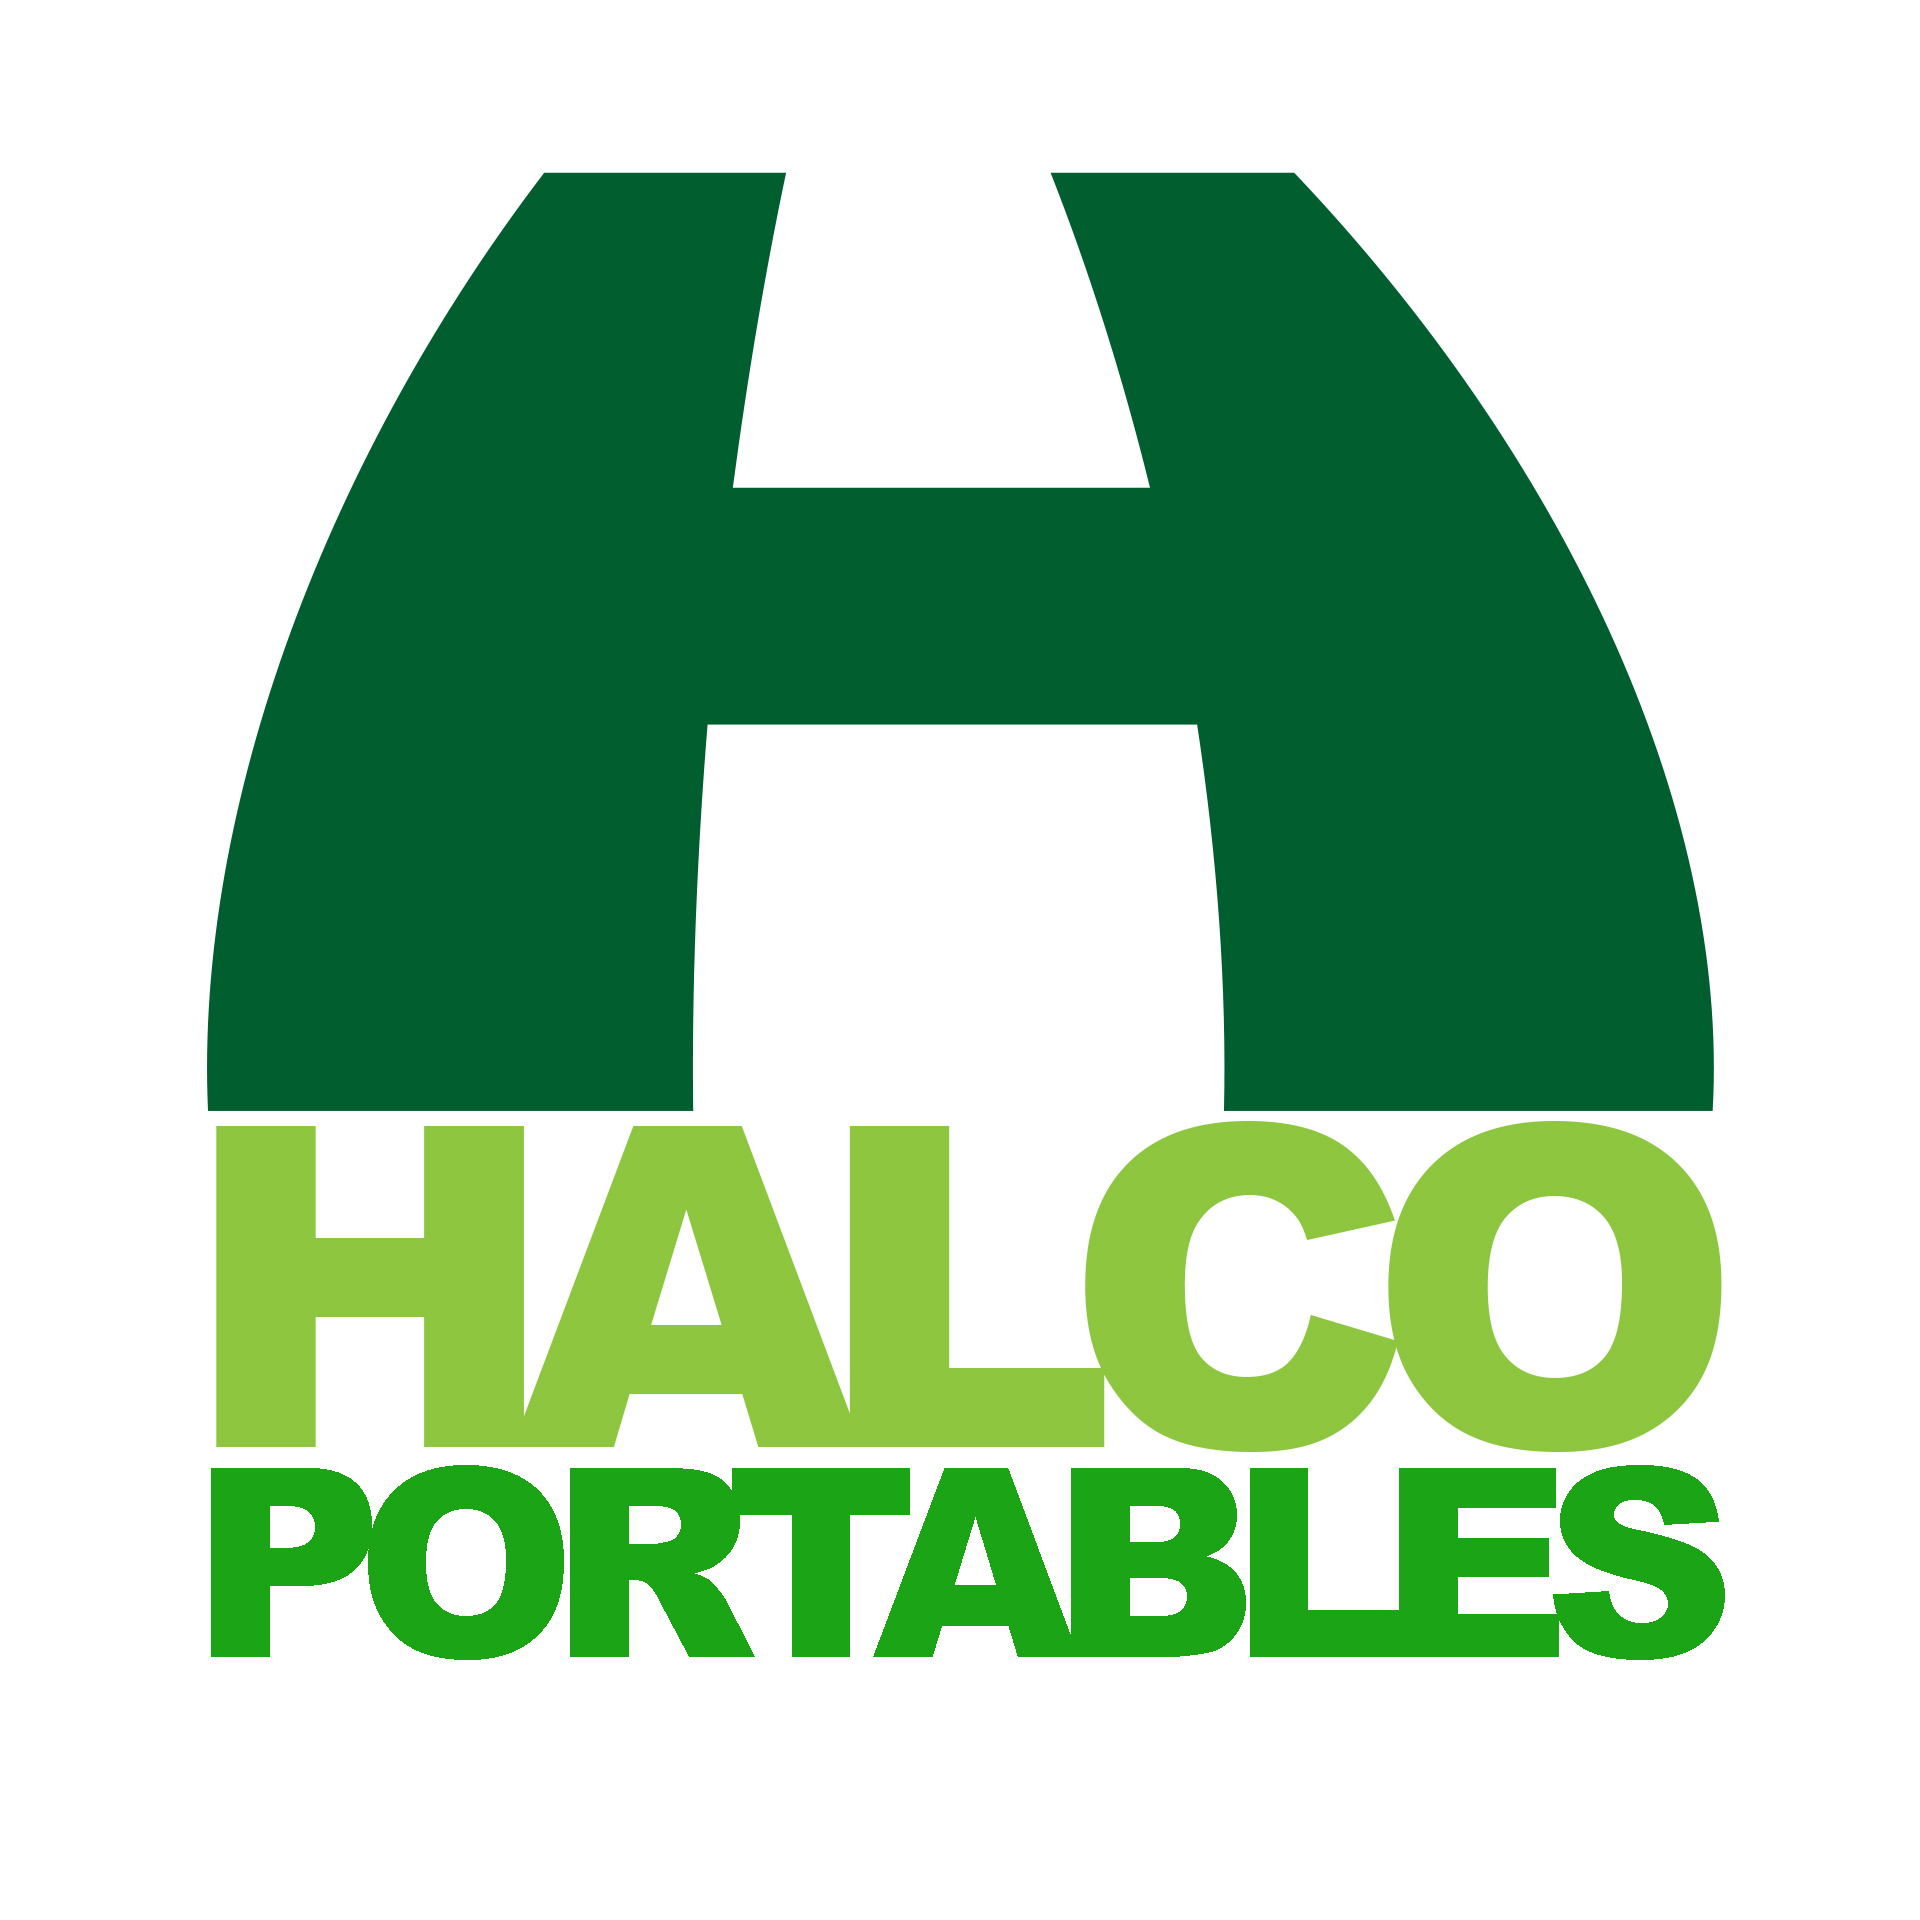 Halco Portables logo.